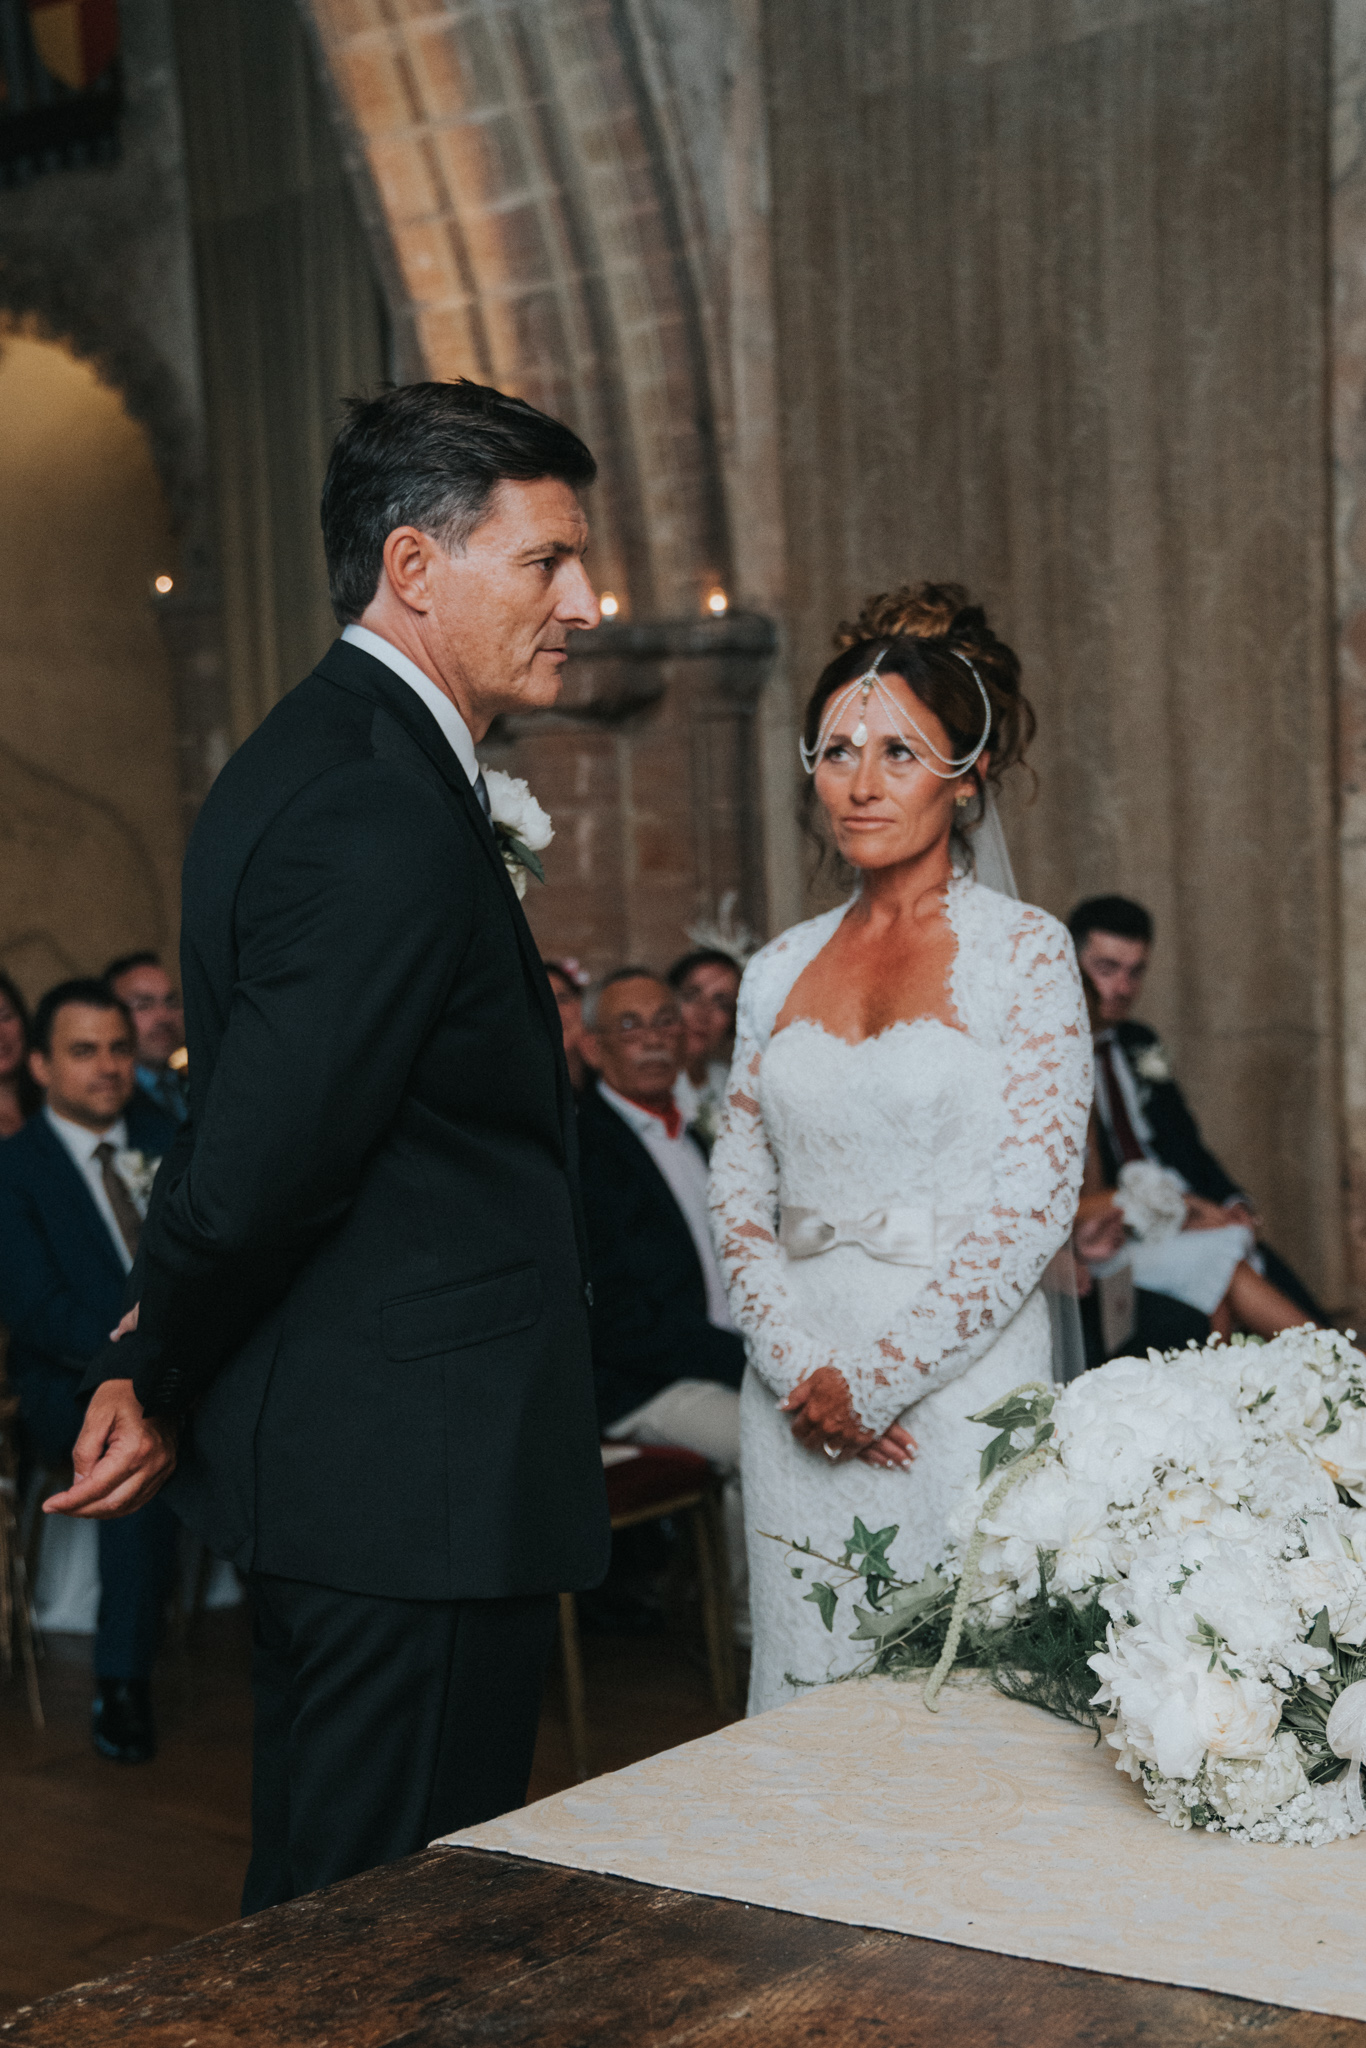 grace-elizabeth-boho-wedding-headingham-castle-essex-wedding-photographer-37.jpg